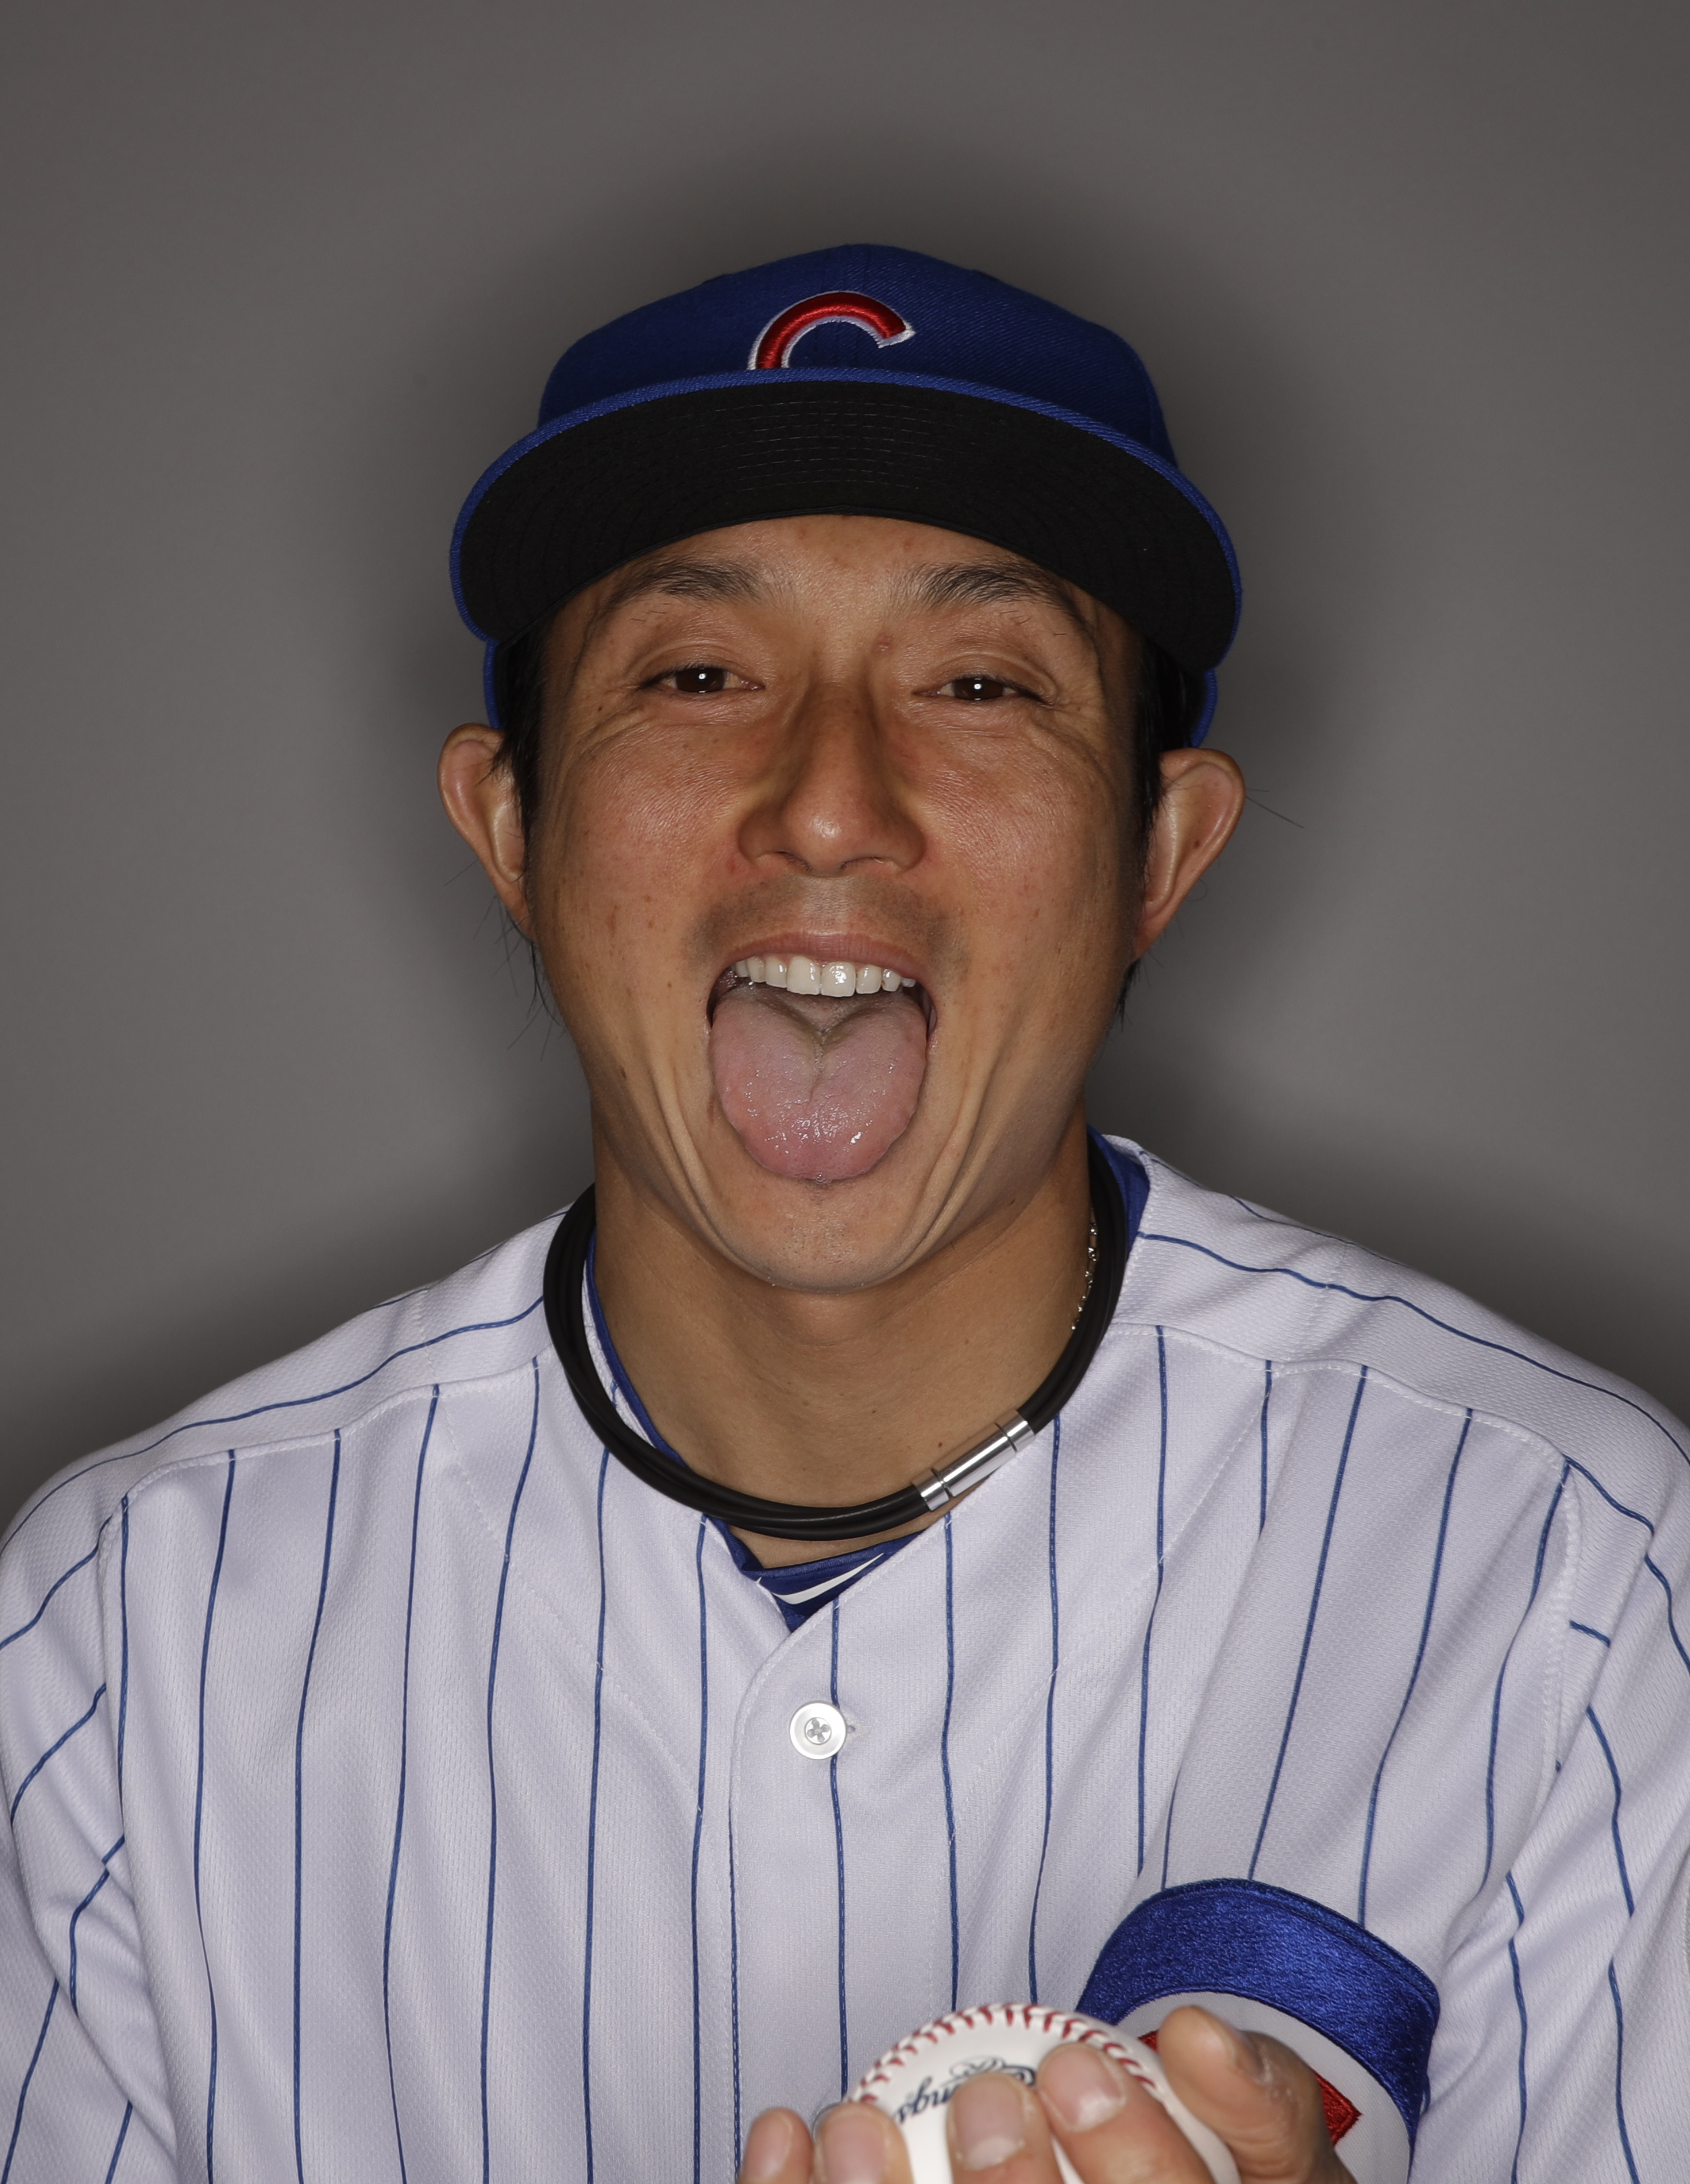 as the cubs release munenori kawasaki, we remember his greatest